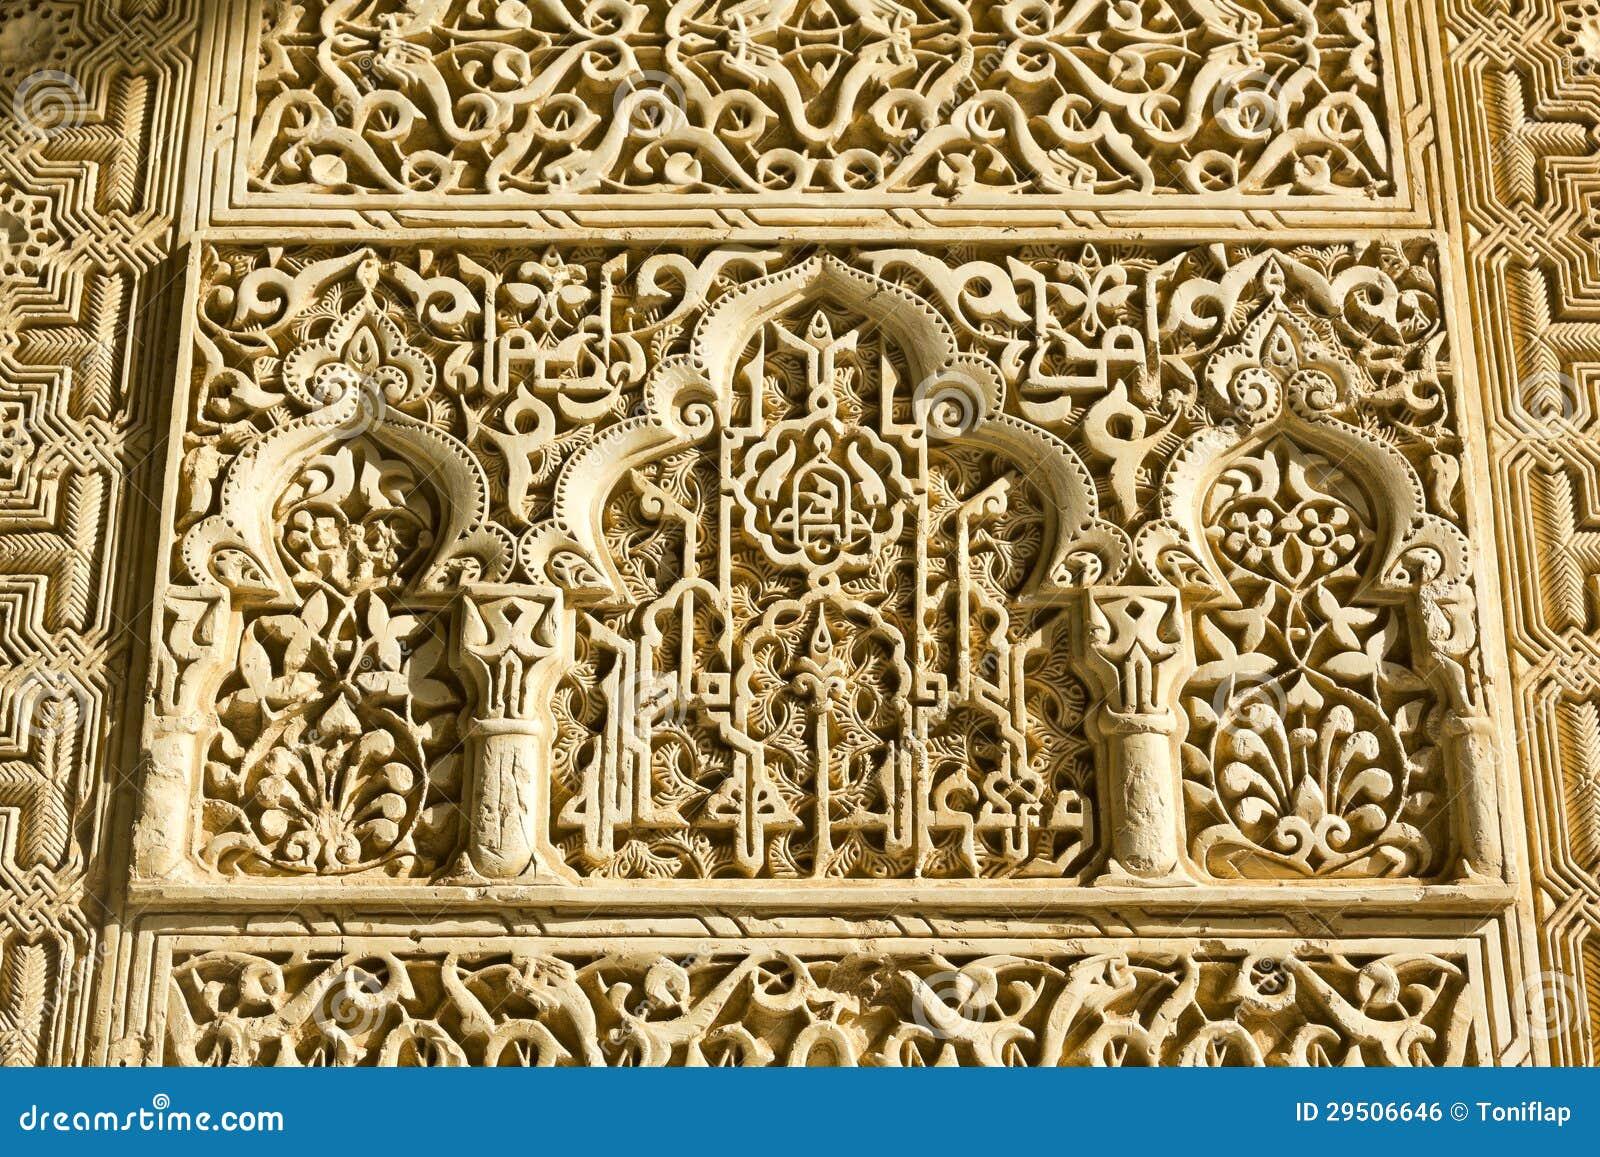 Arabesques in Binnenplaats van Leeuwen, Granada, Spanje